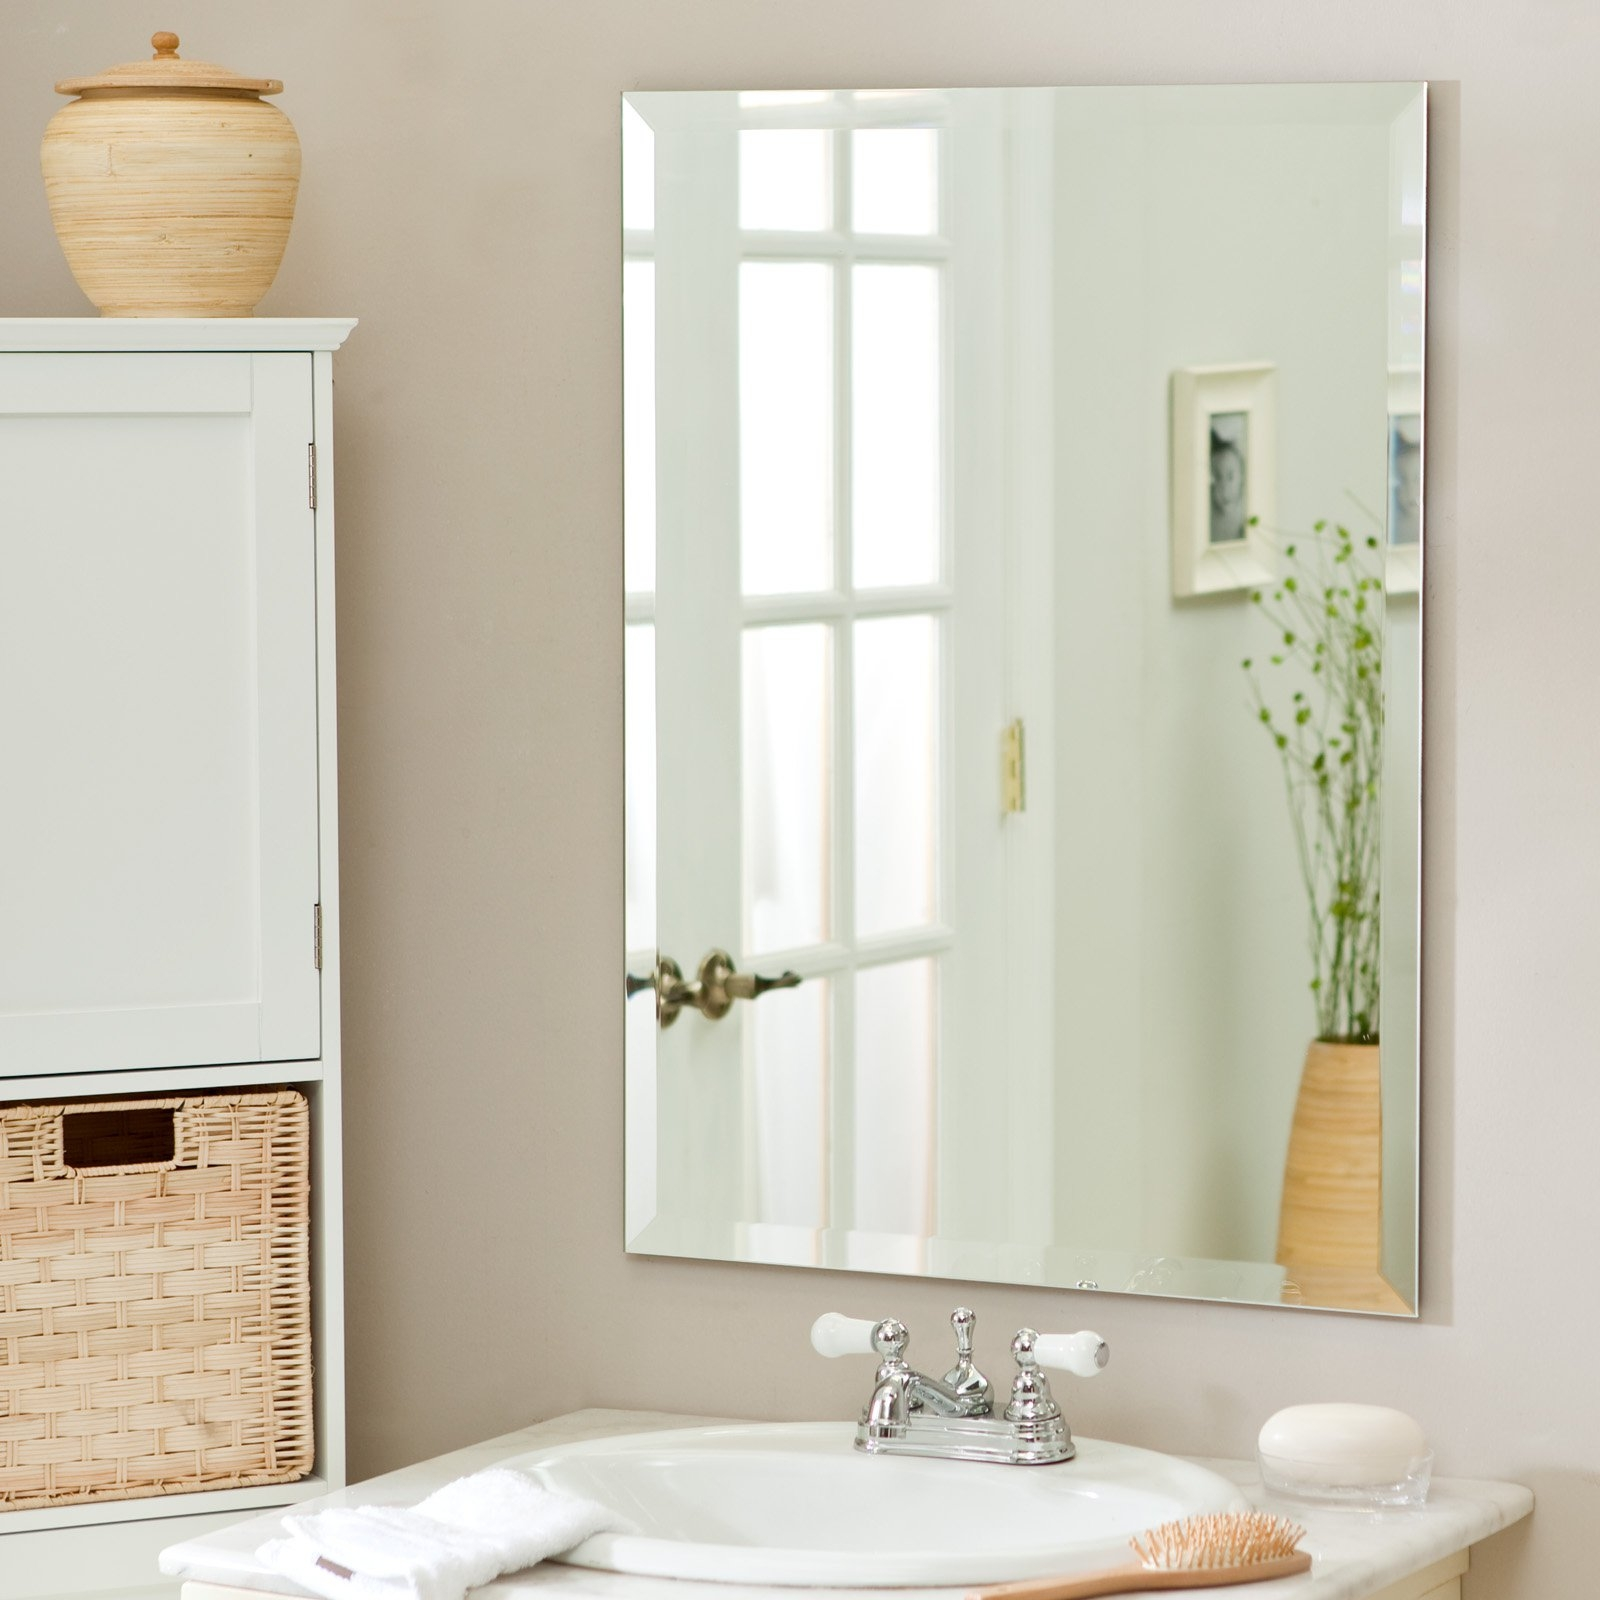 Beveled Bathroom Wall Mirrors